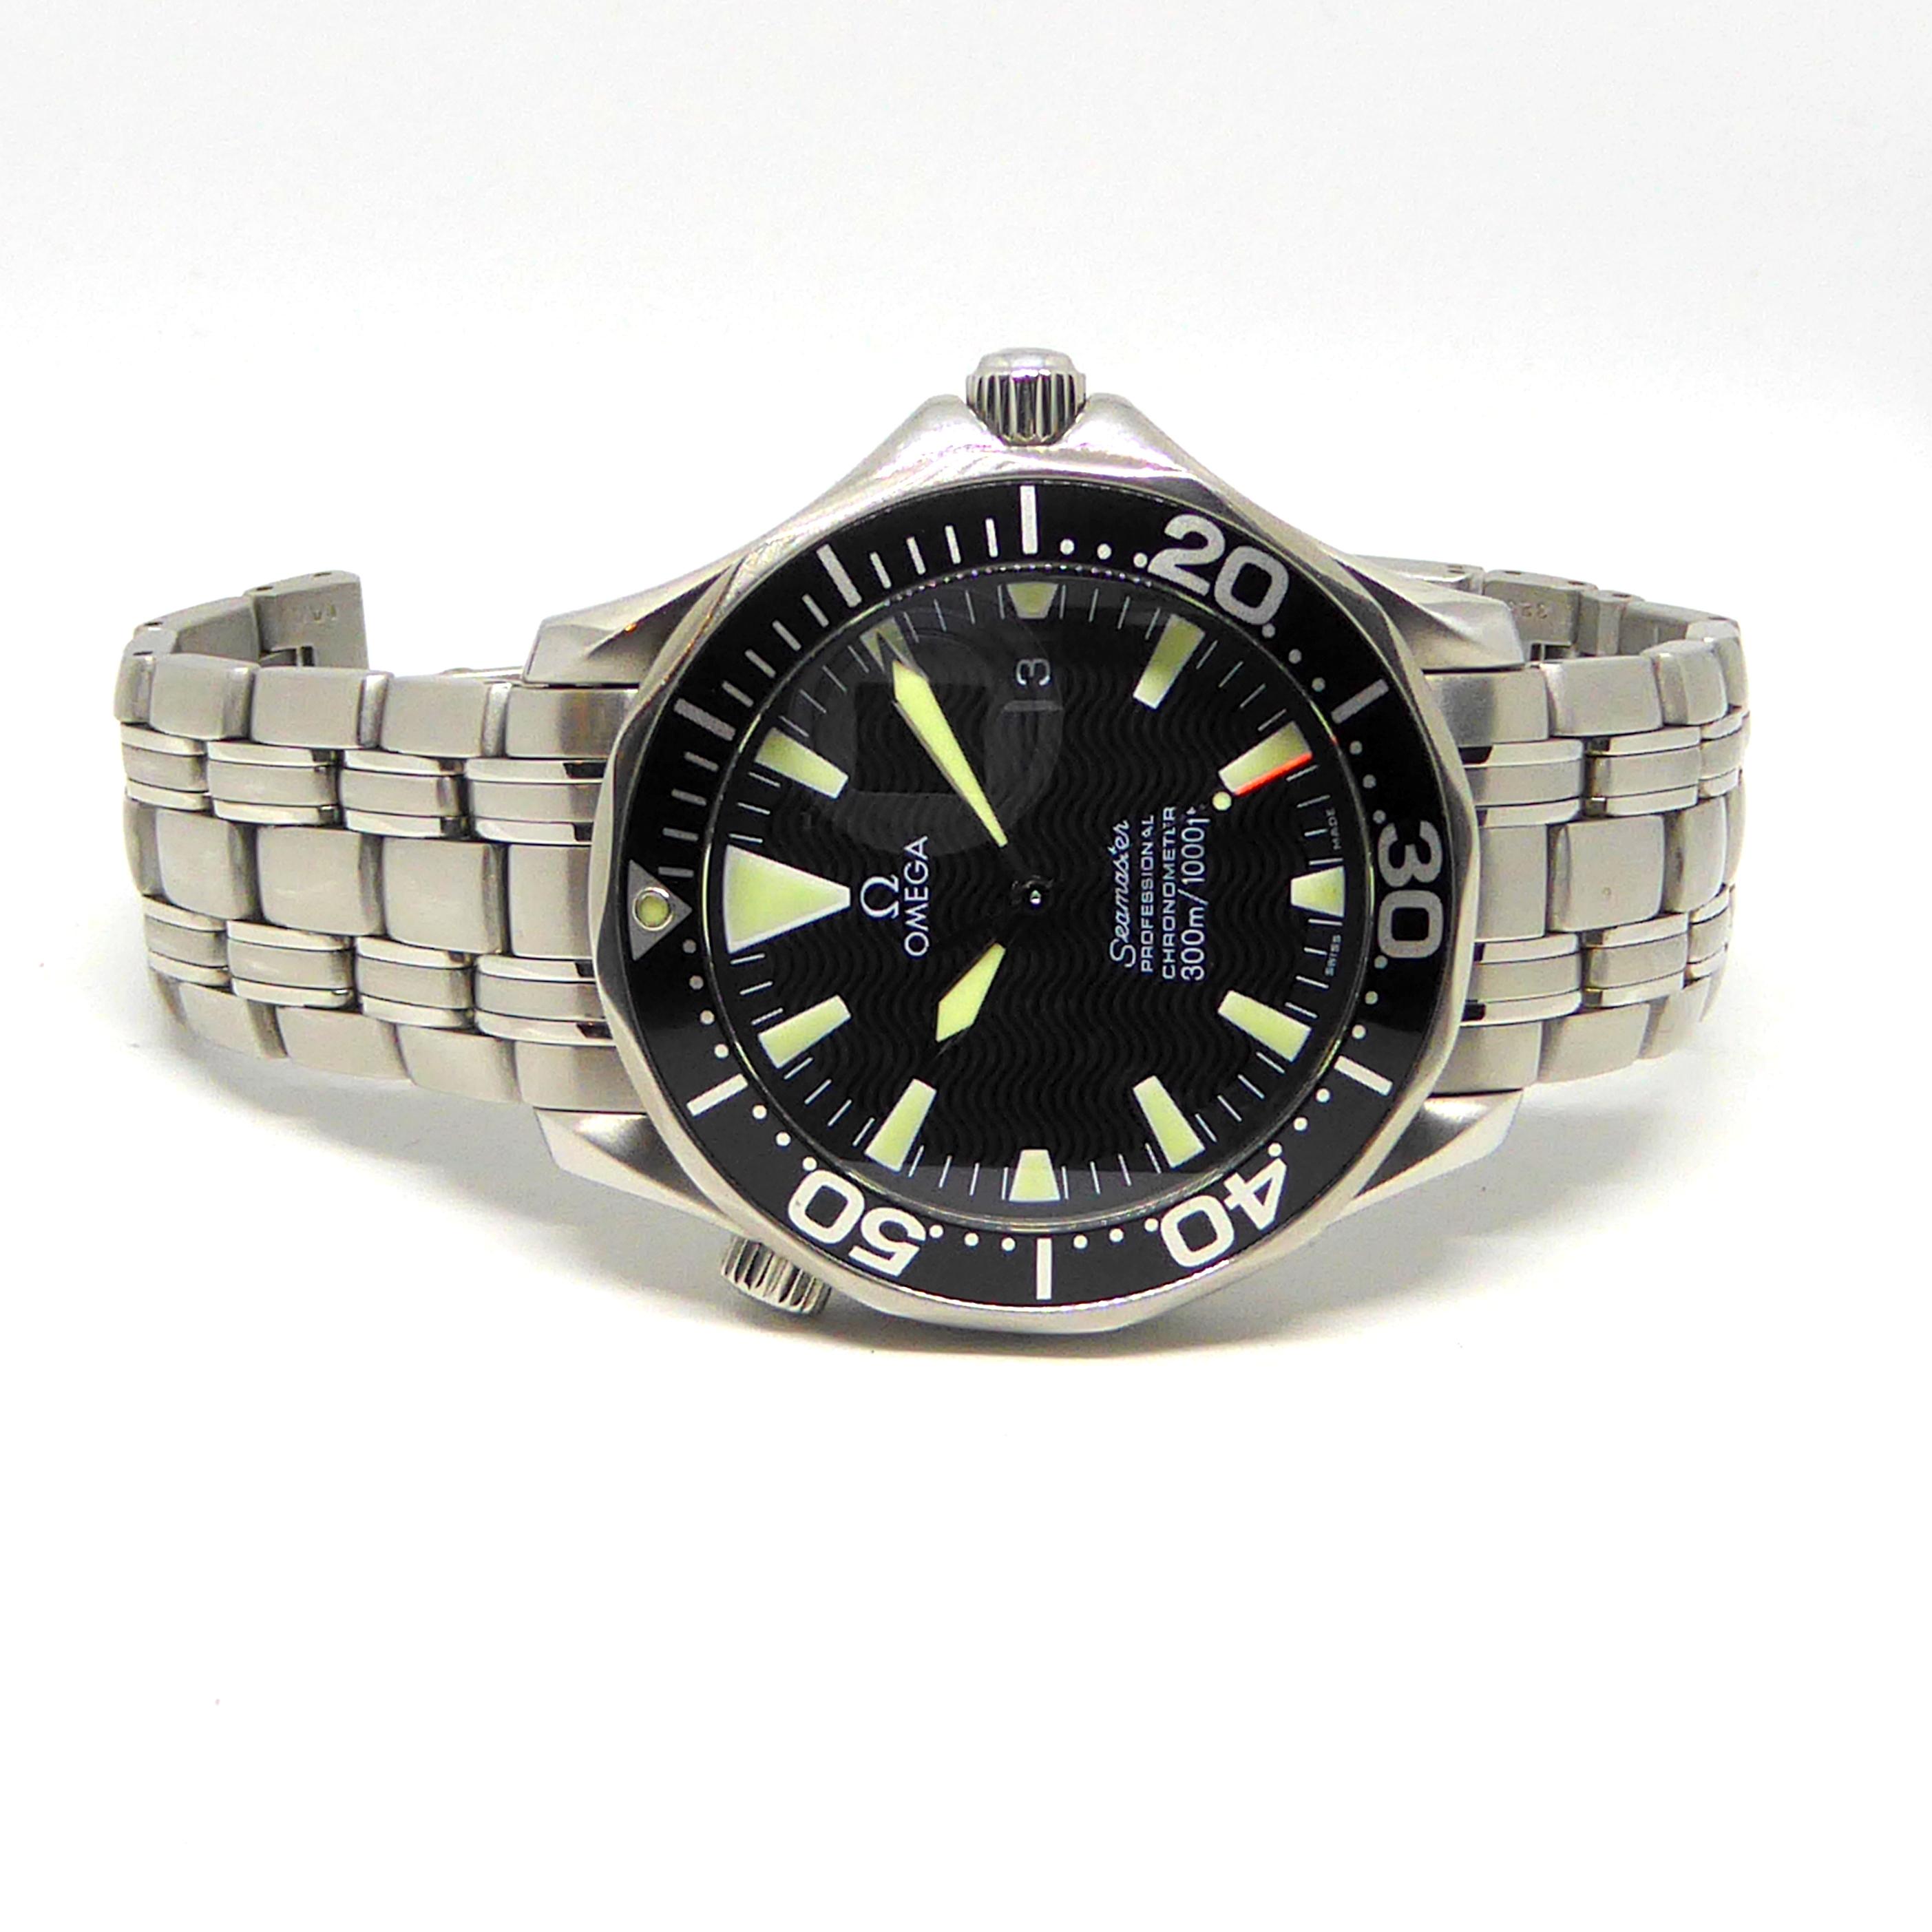 Omega Seamaster Professional Chronometer 300m Automatic Black Wave dial